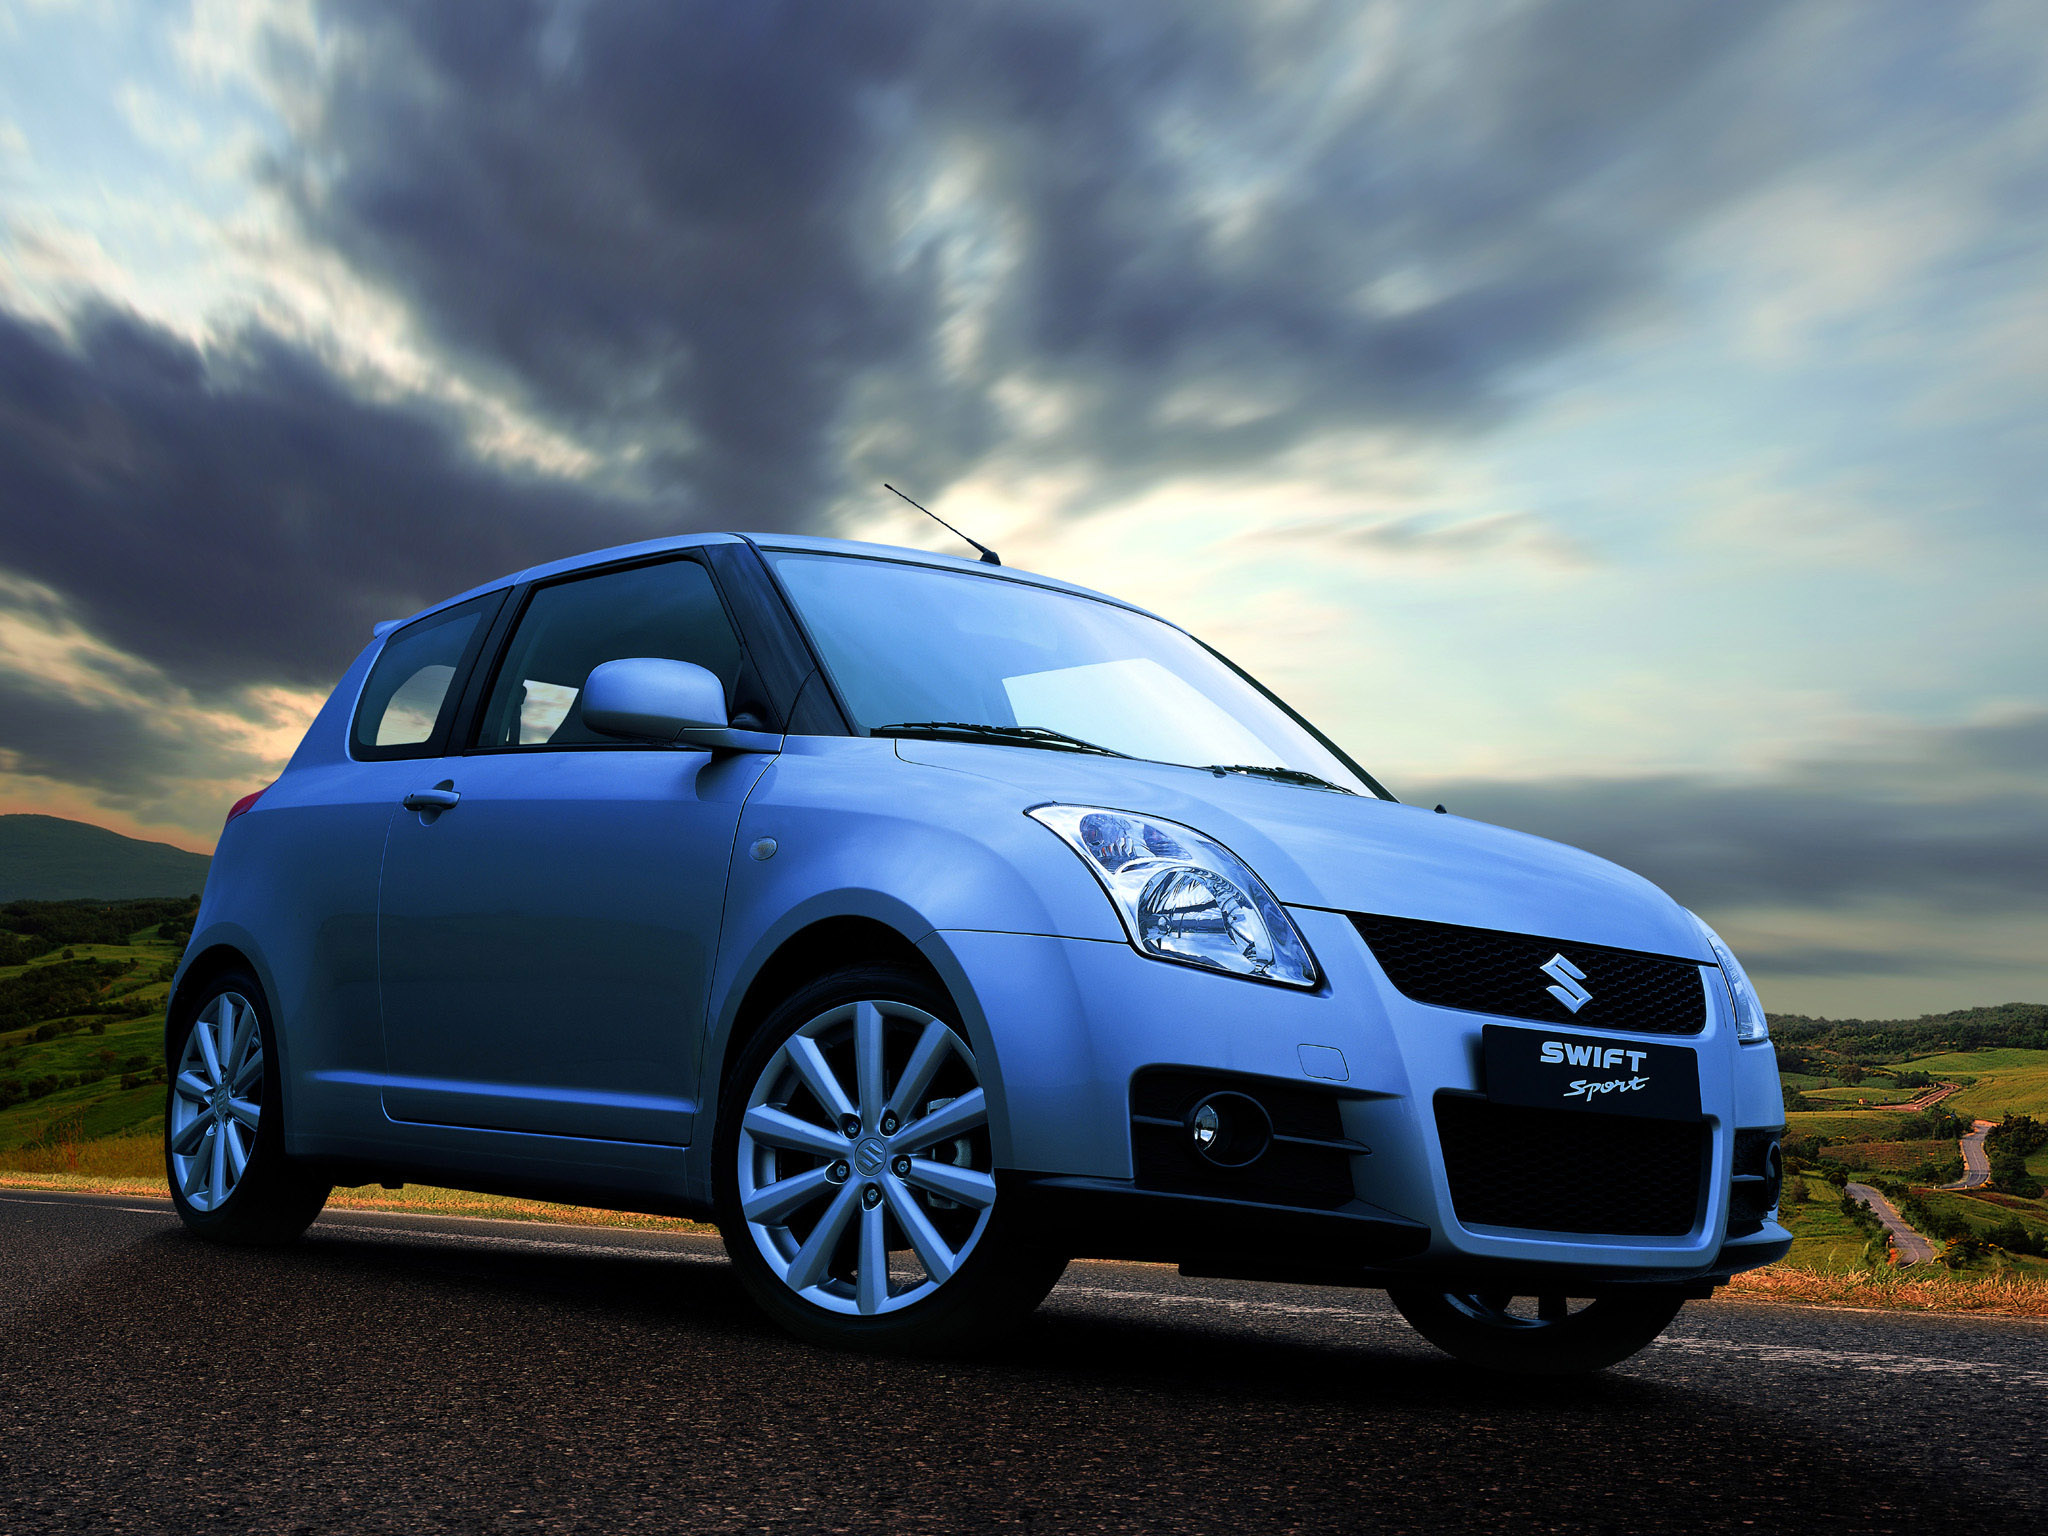 Suzuki swift photo gallery